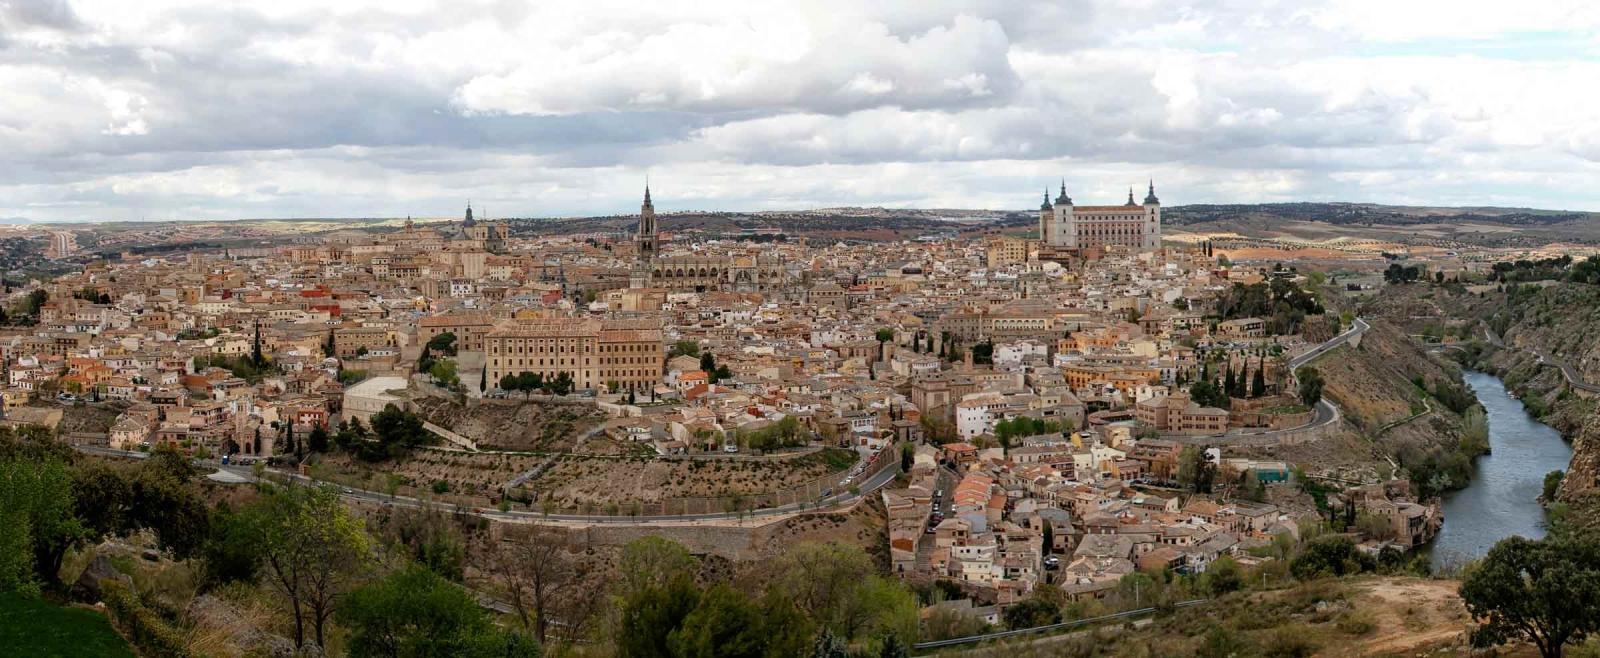 ToledoPanorama2website.jpg